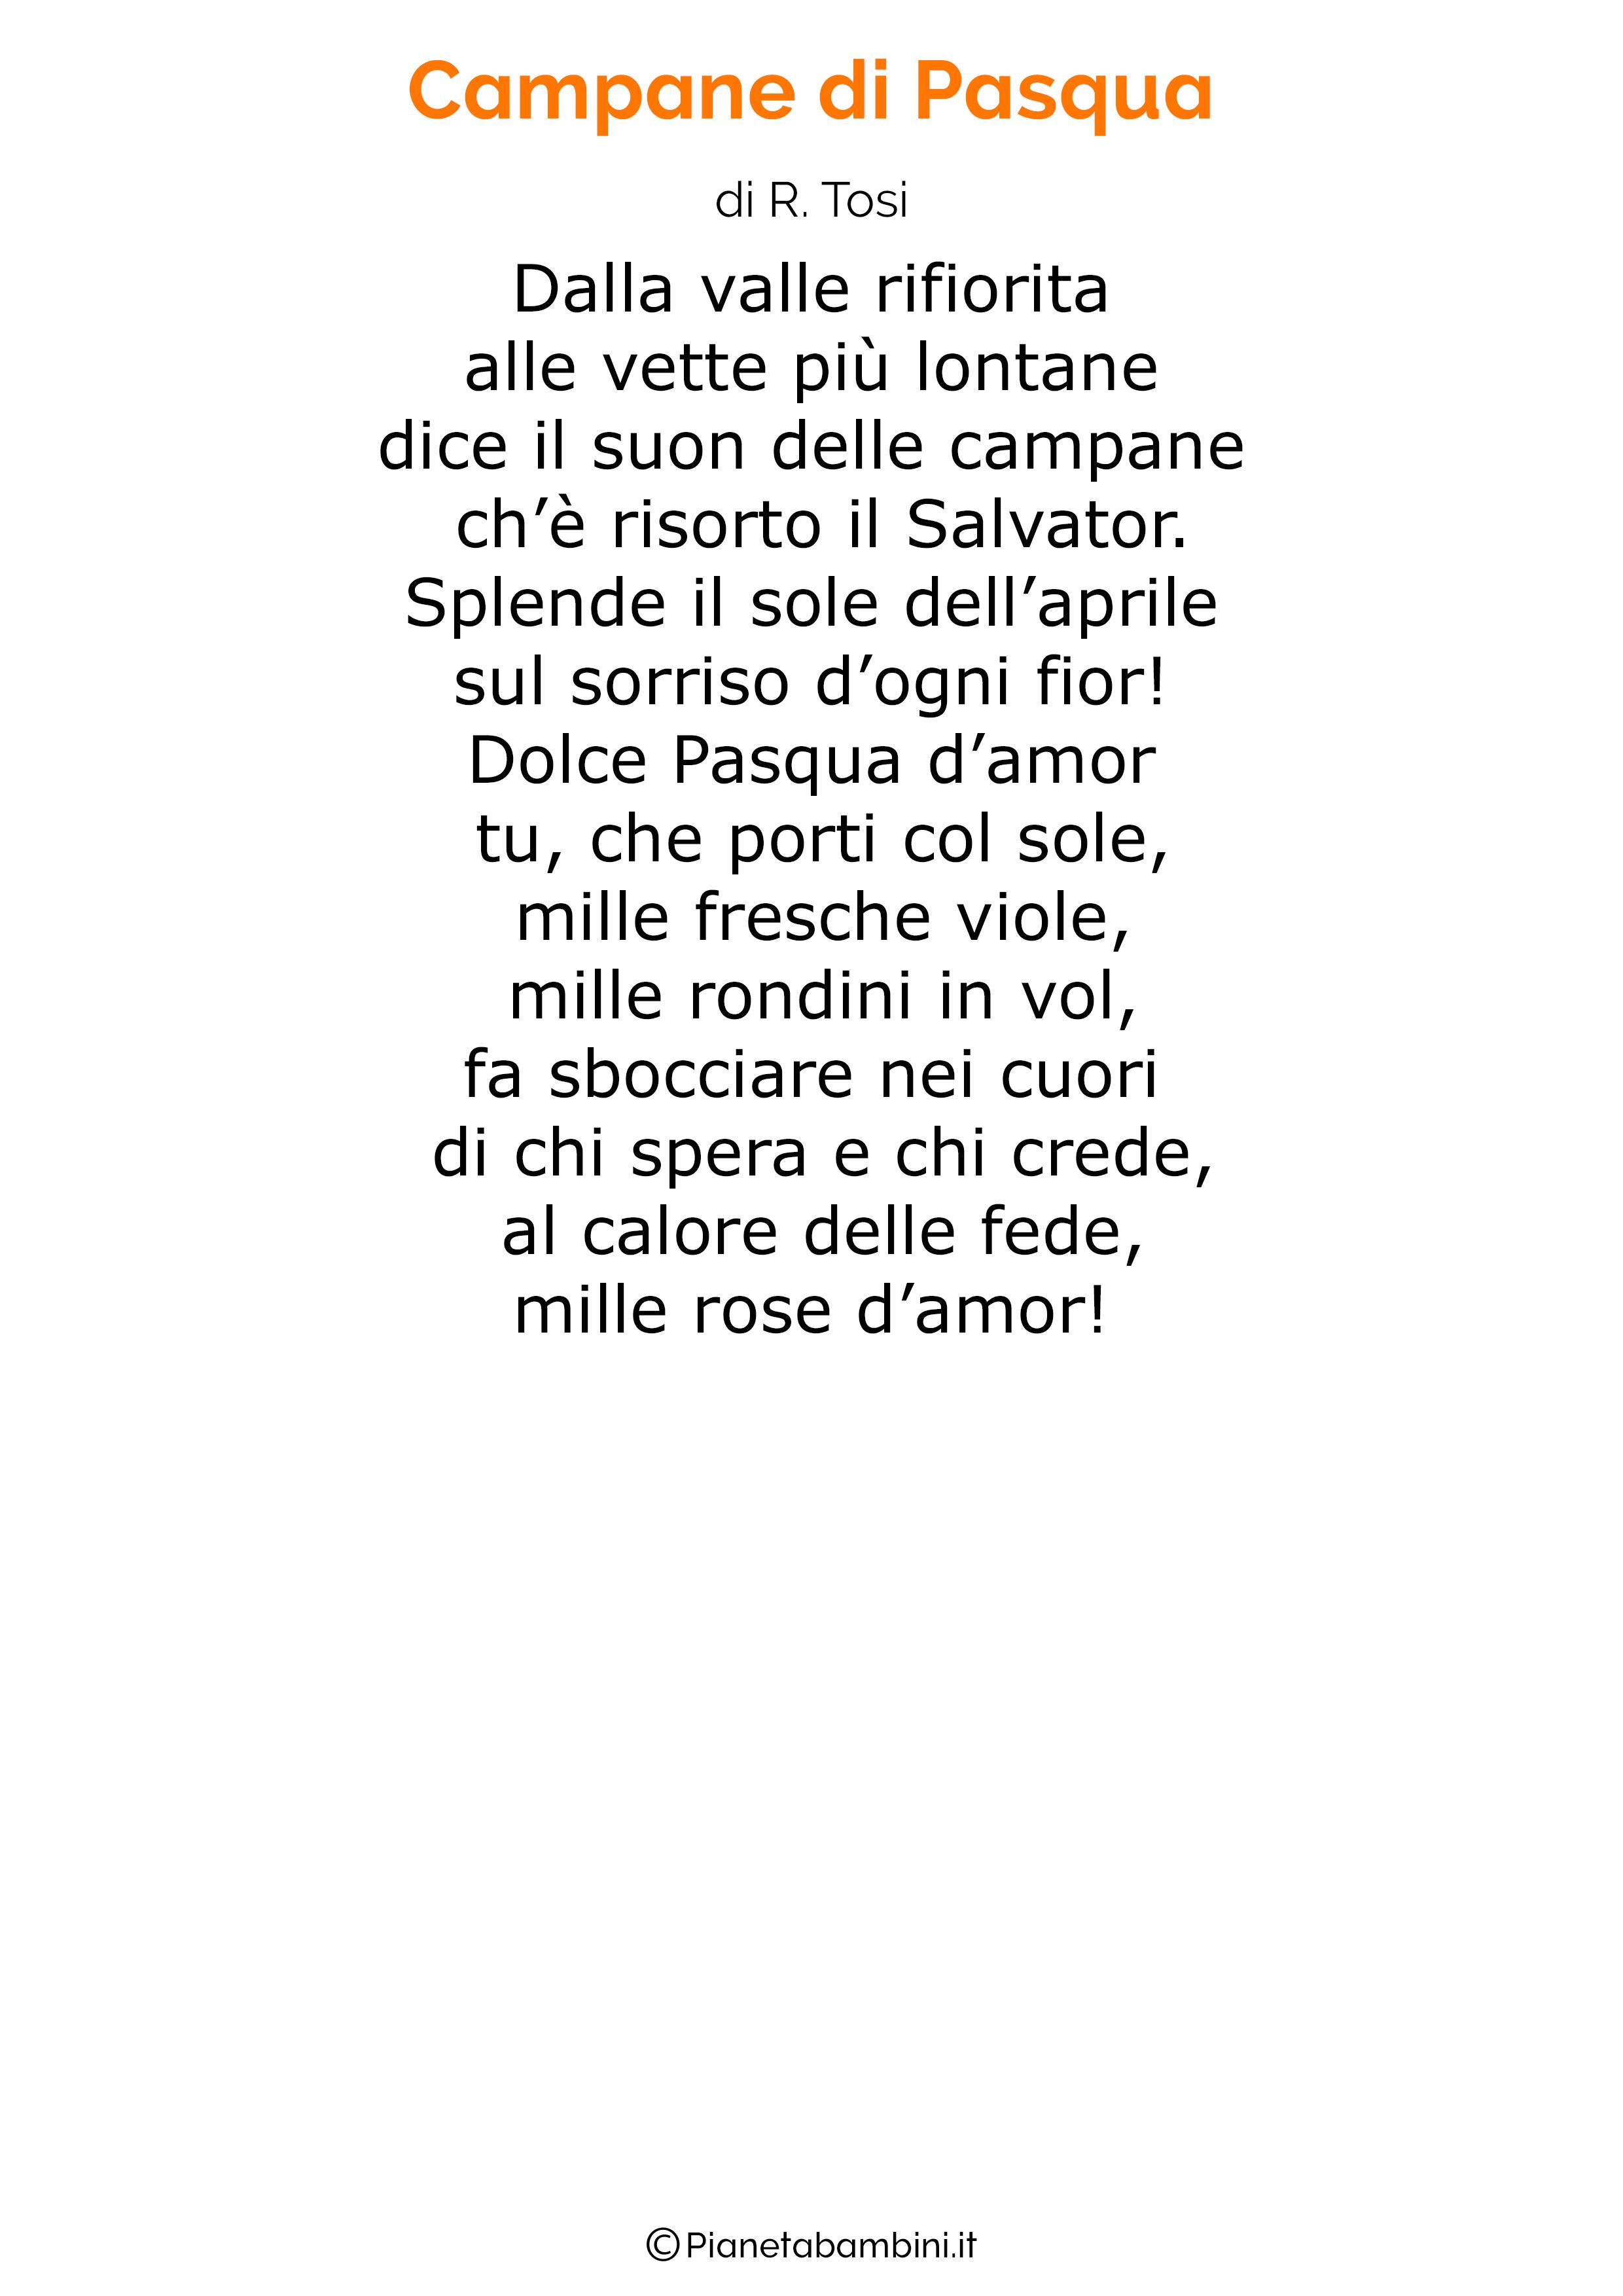 Poesia di Pasqua 40